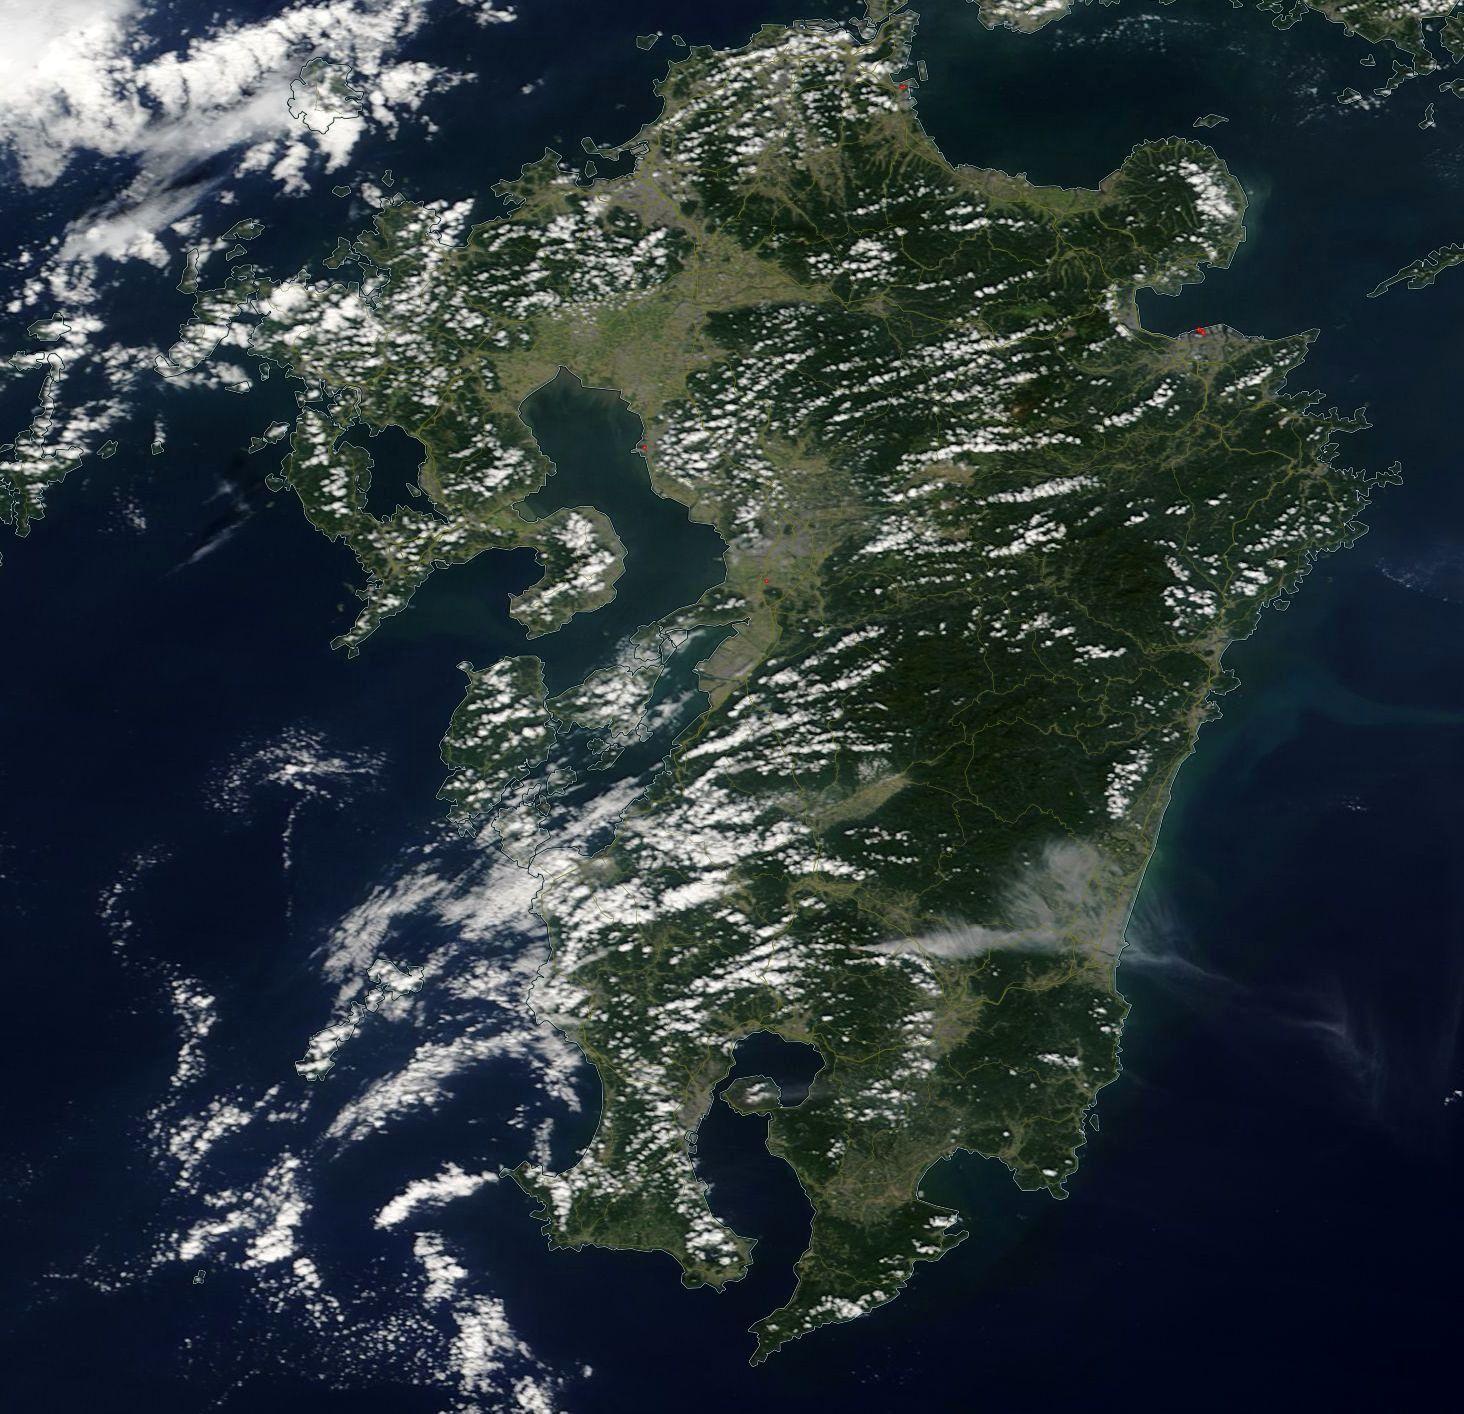 Kyushu with the erupting Shinmoedake on 11.10.2017 - Doc. Nasa-worldview EOSDIS